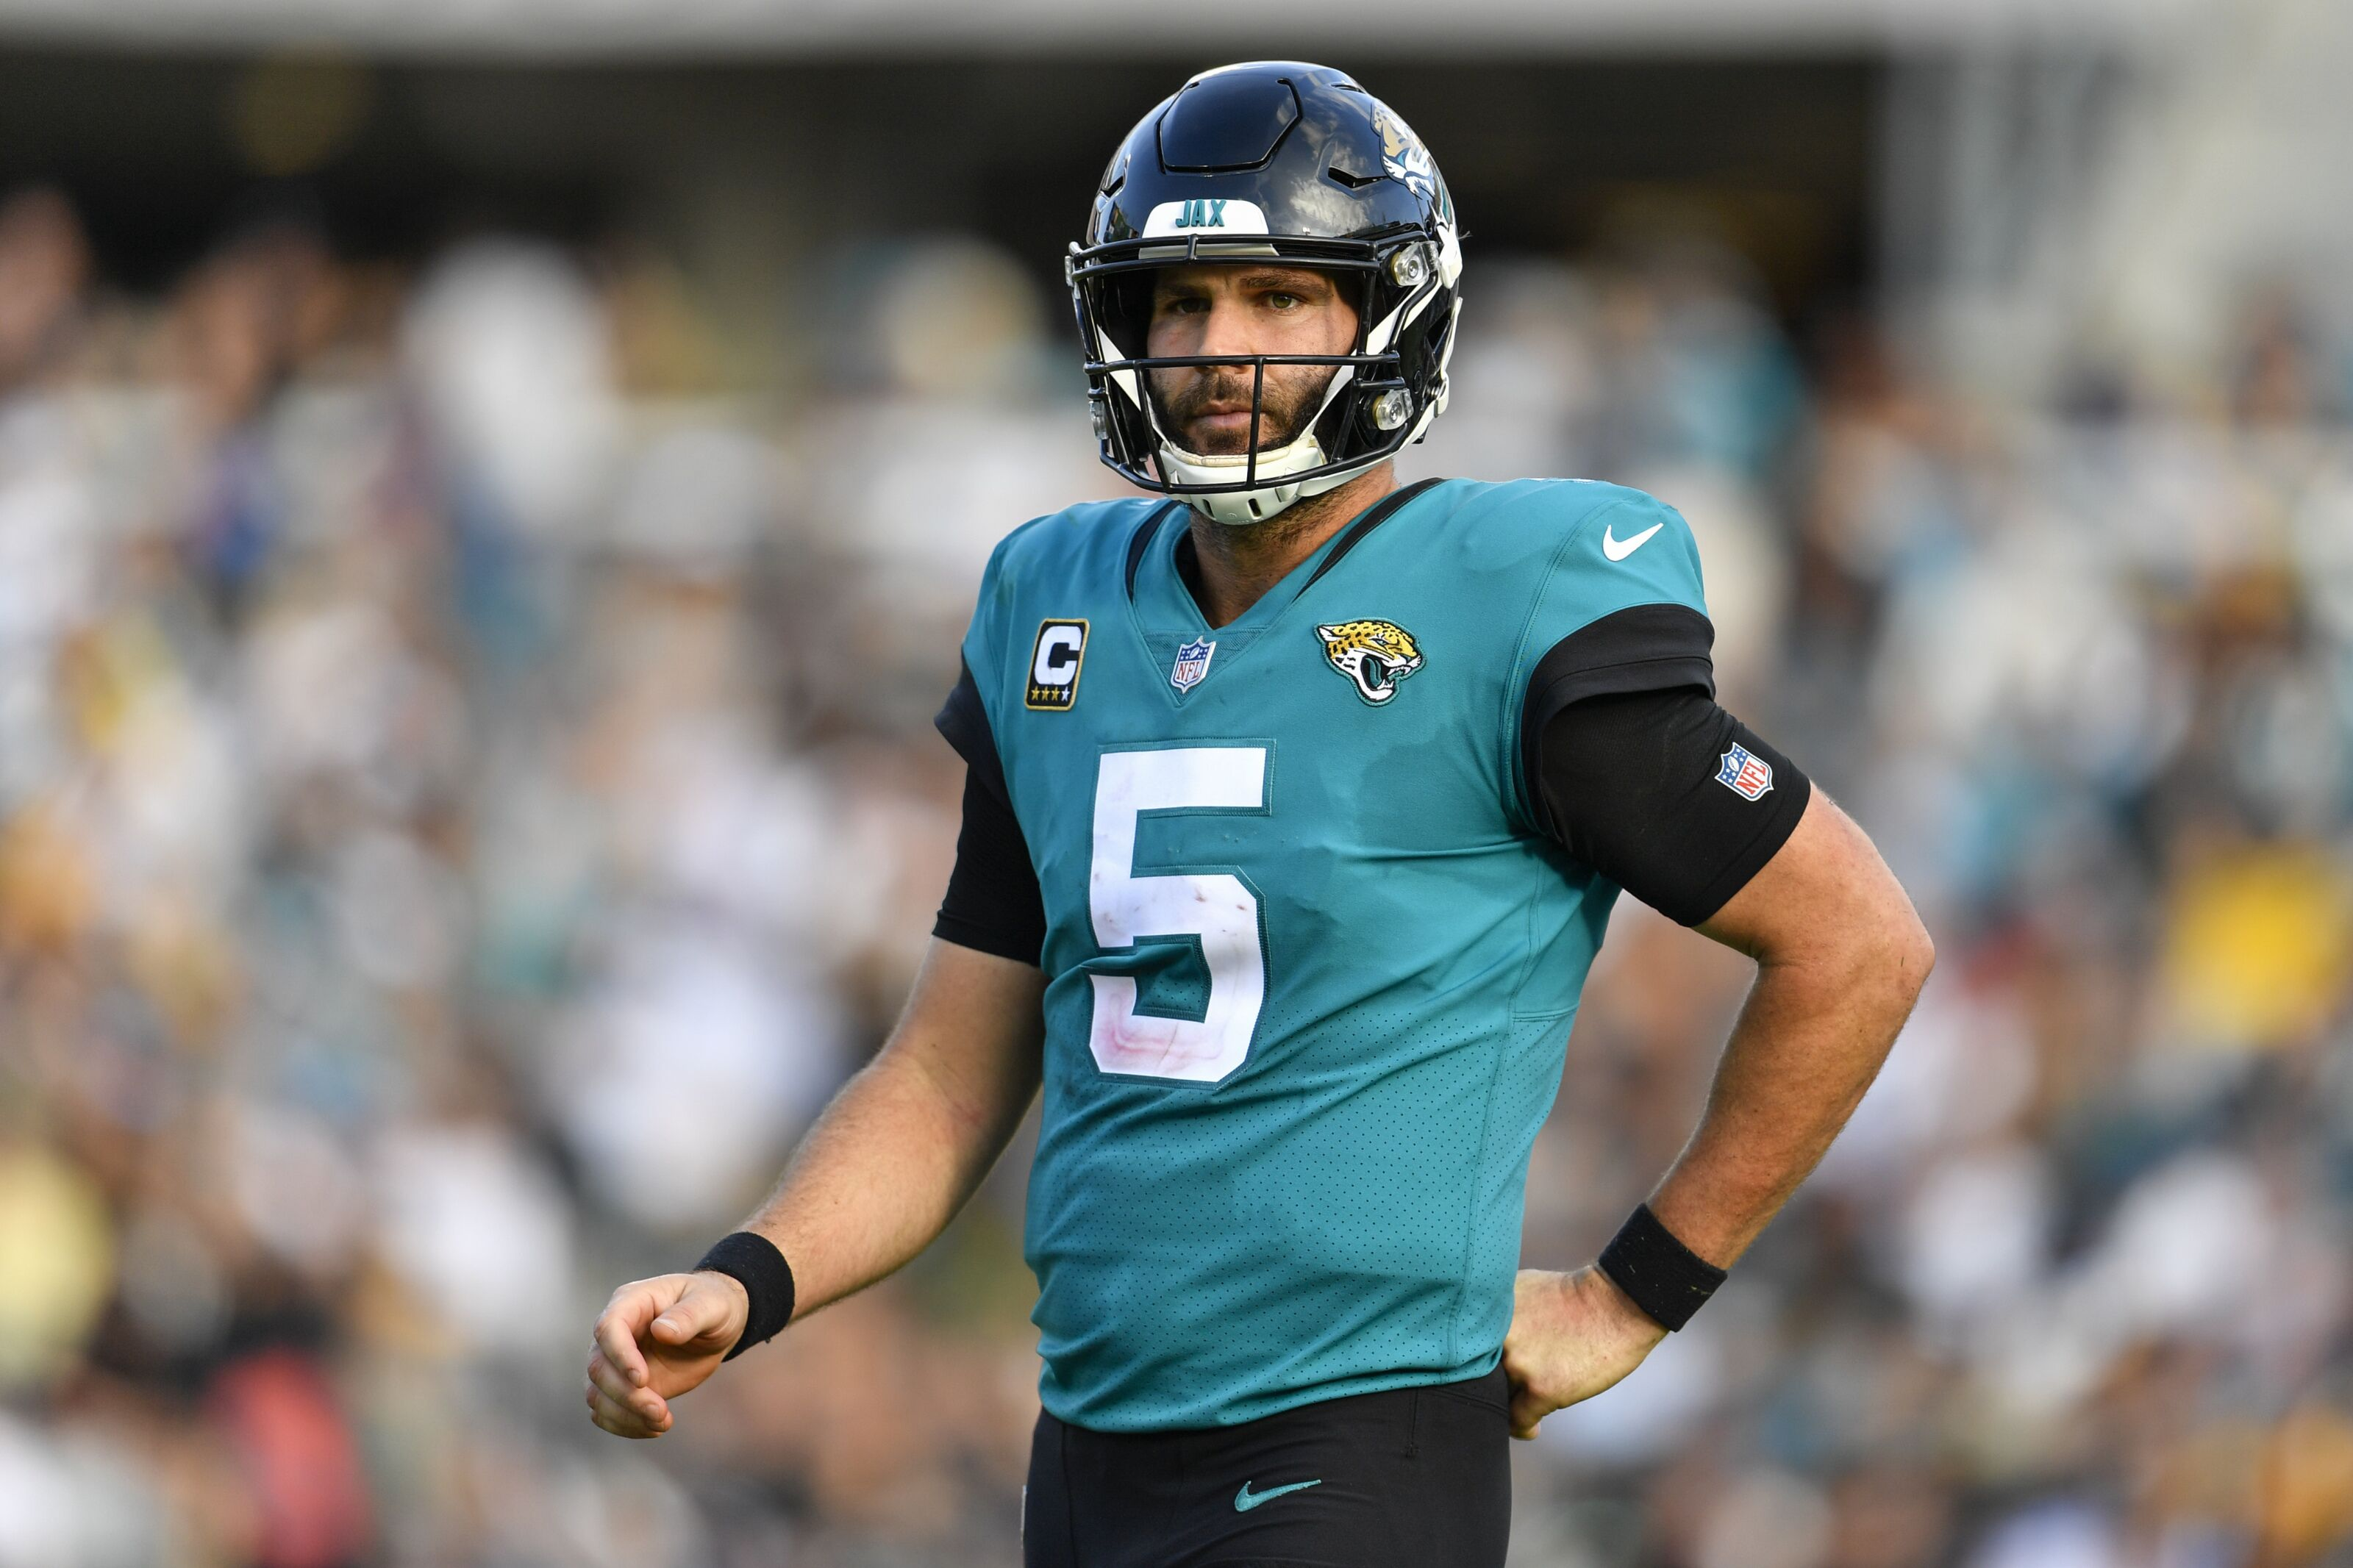 ad6a3757ae1 Jacksonville Jaguars dreadful quarterback dilemma could last a while